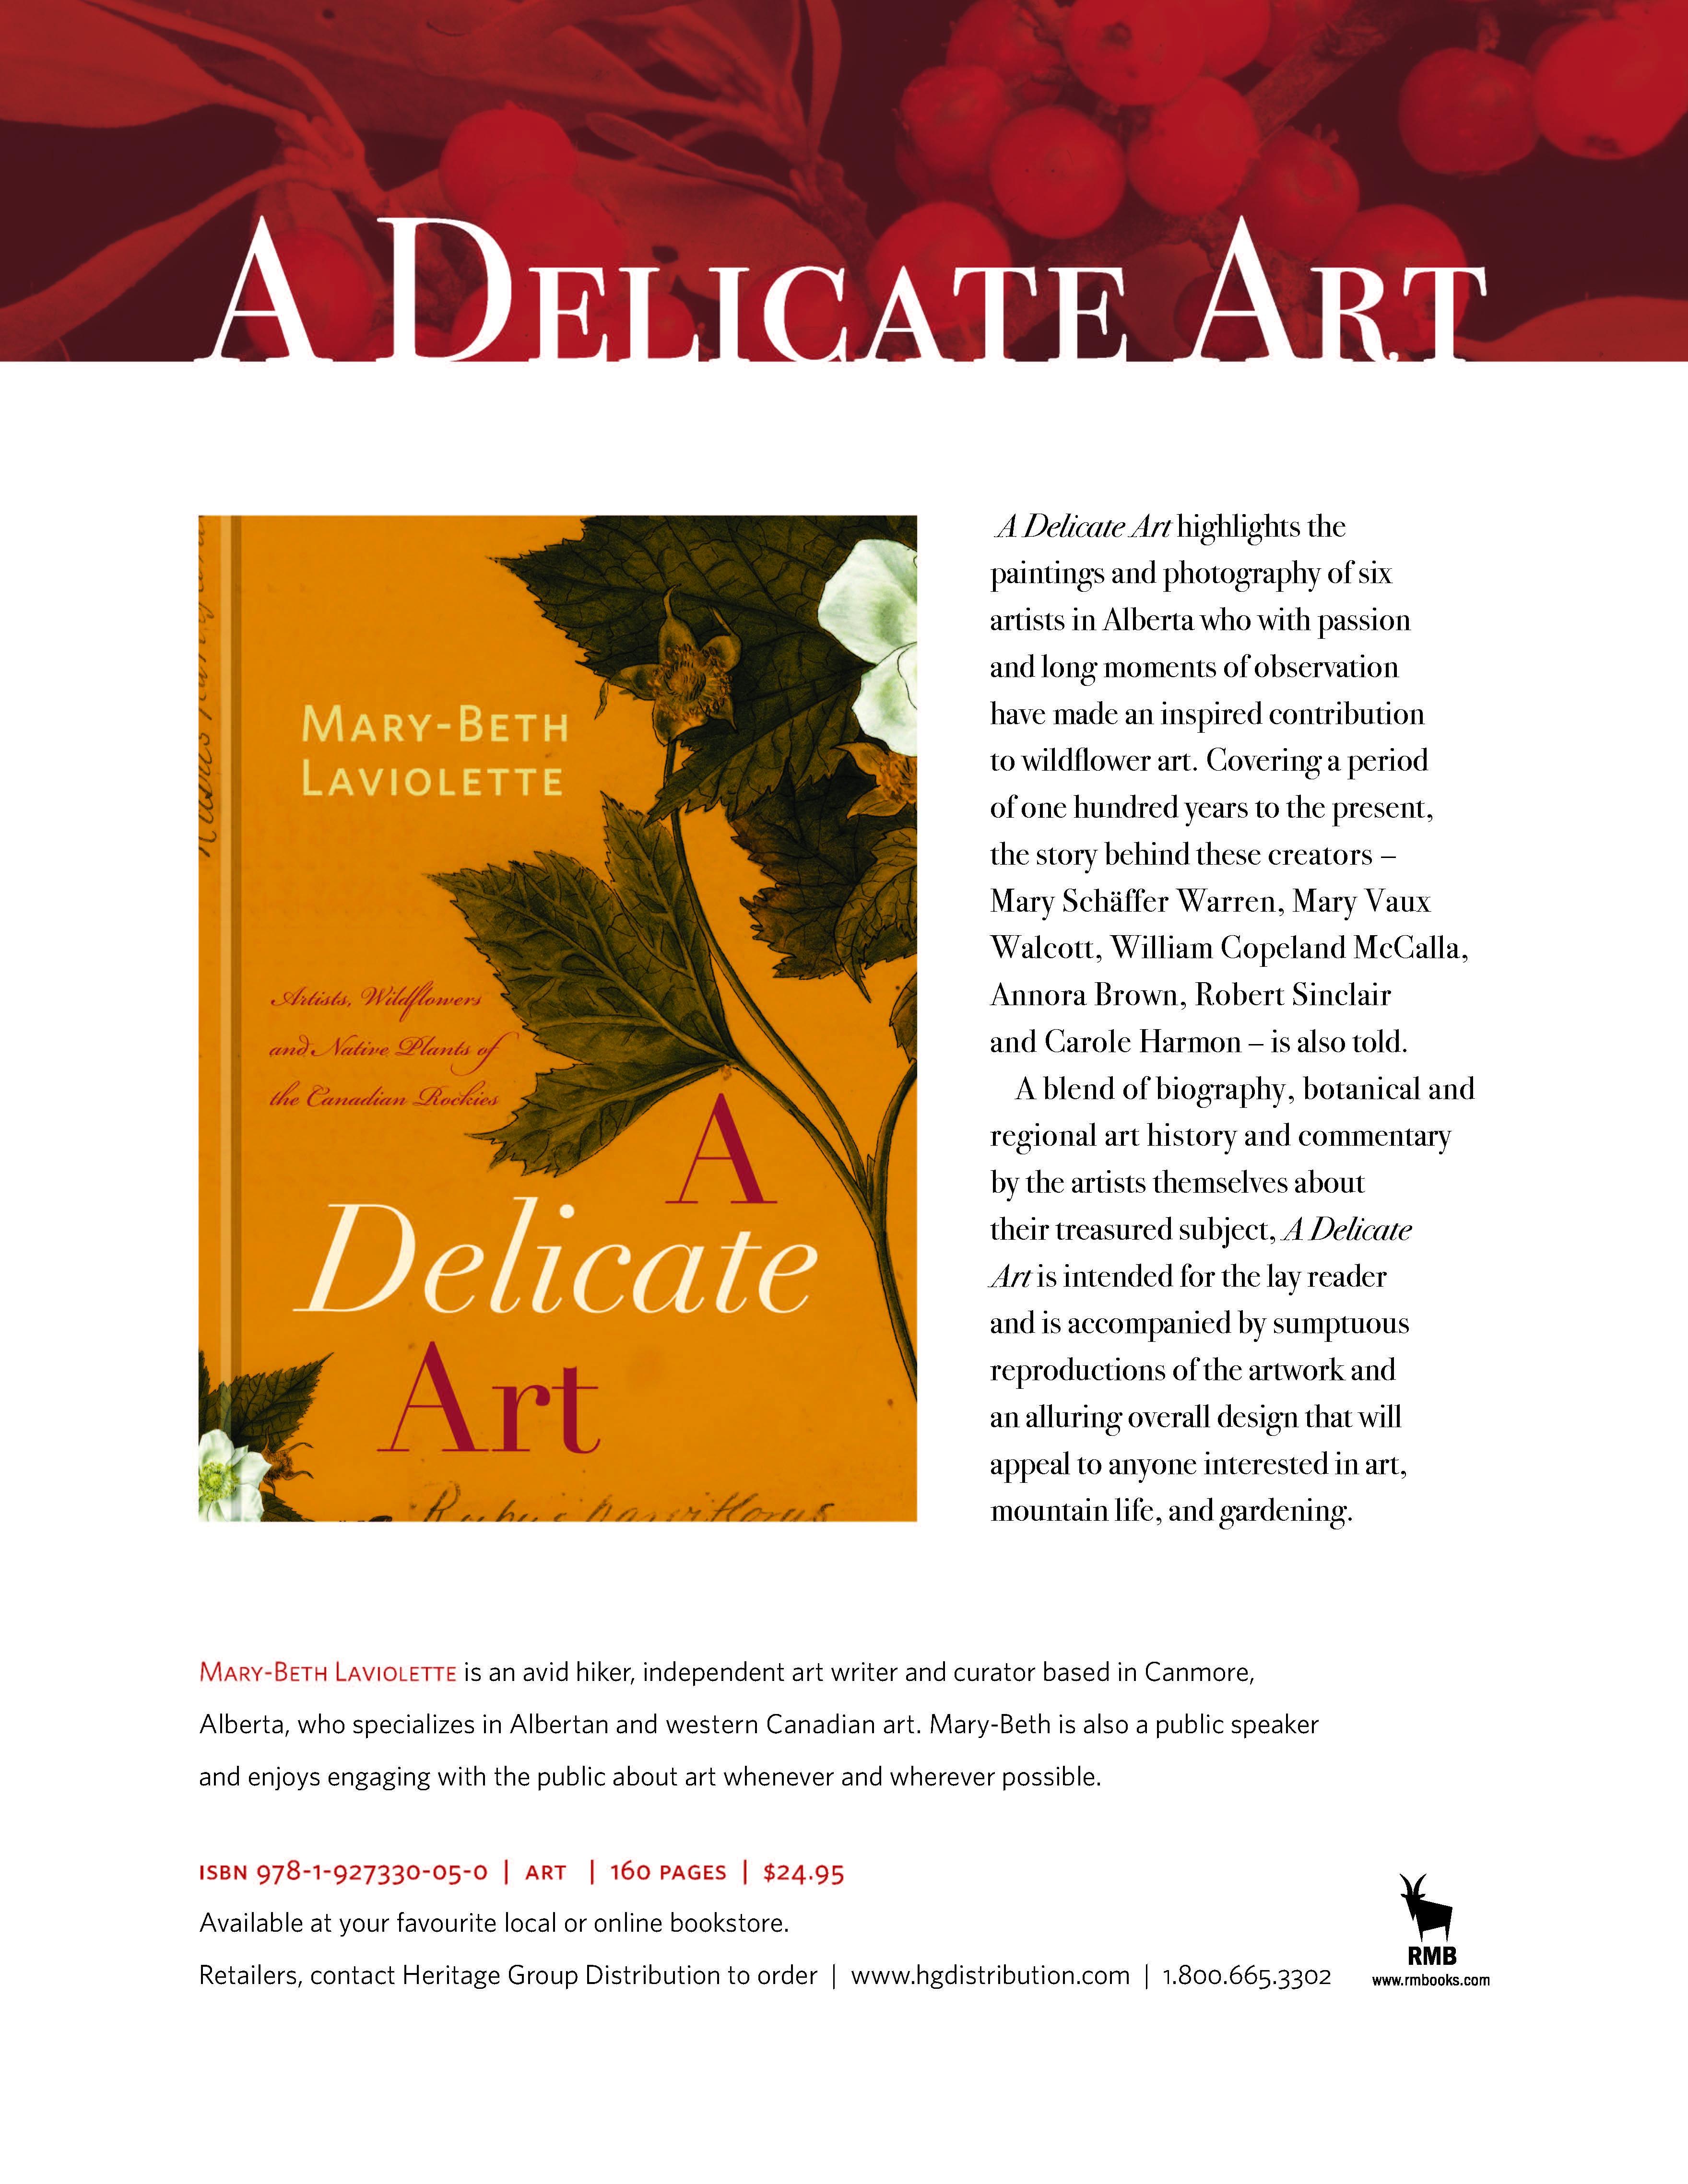 Delicate Art - Mary-Beth Laviolette